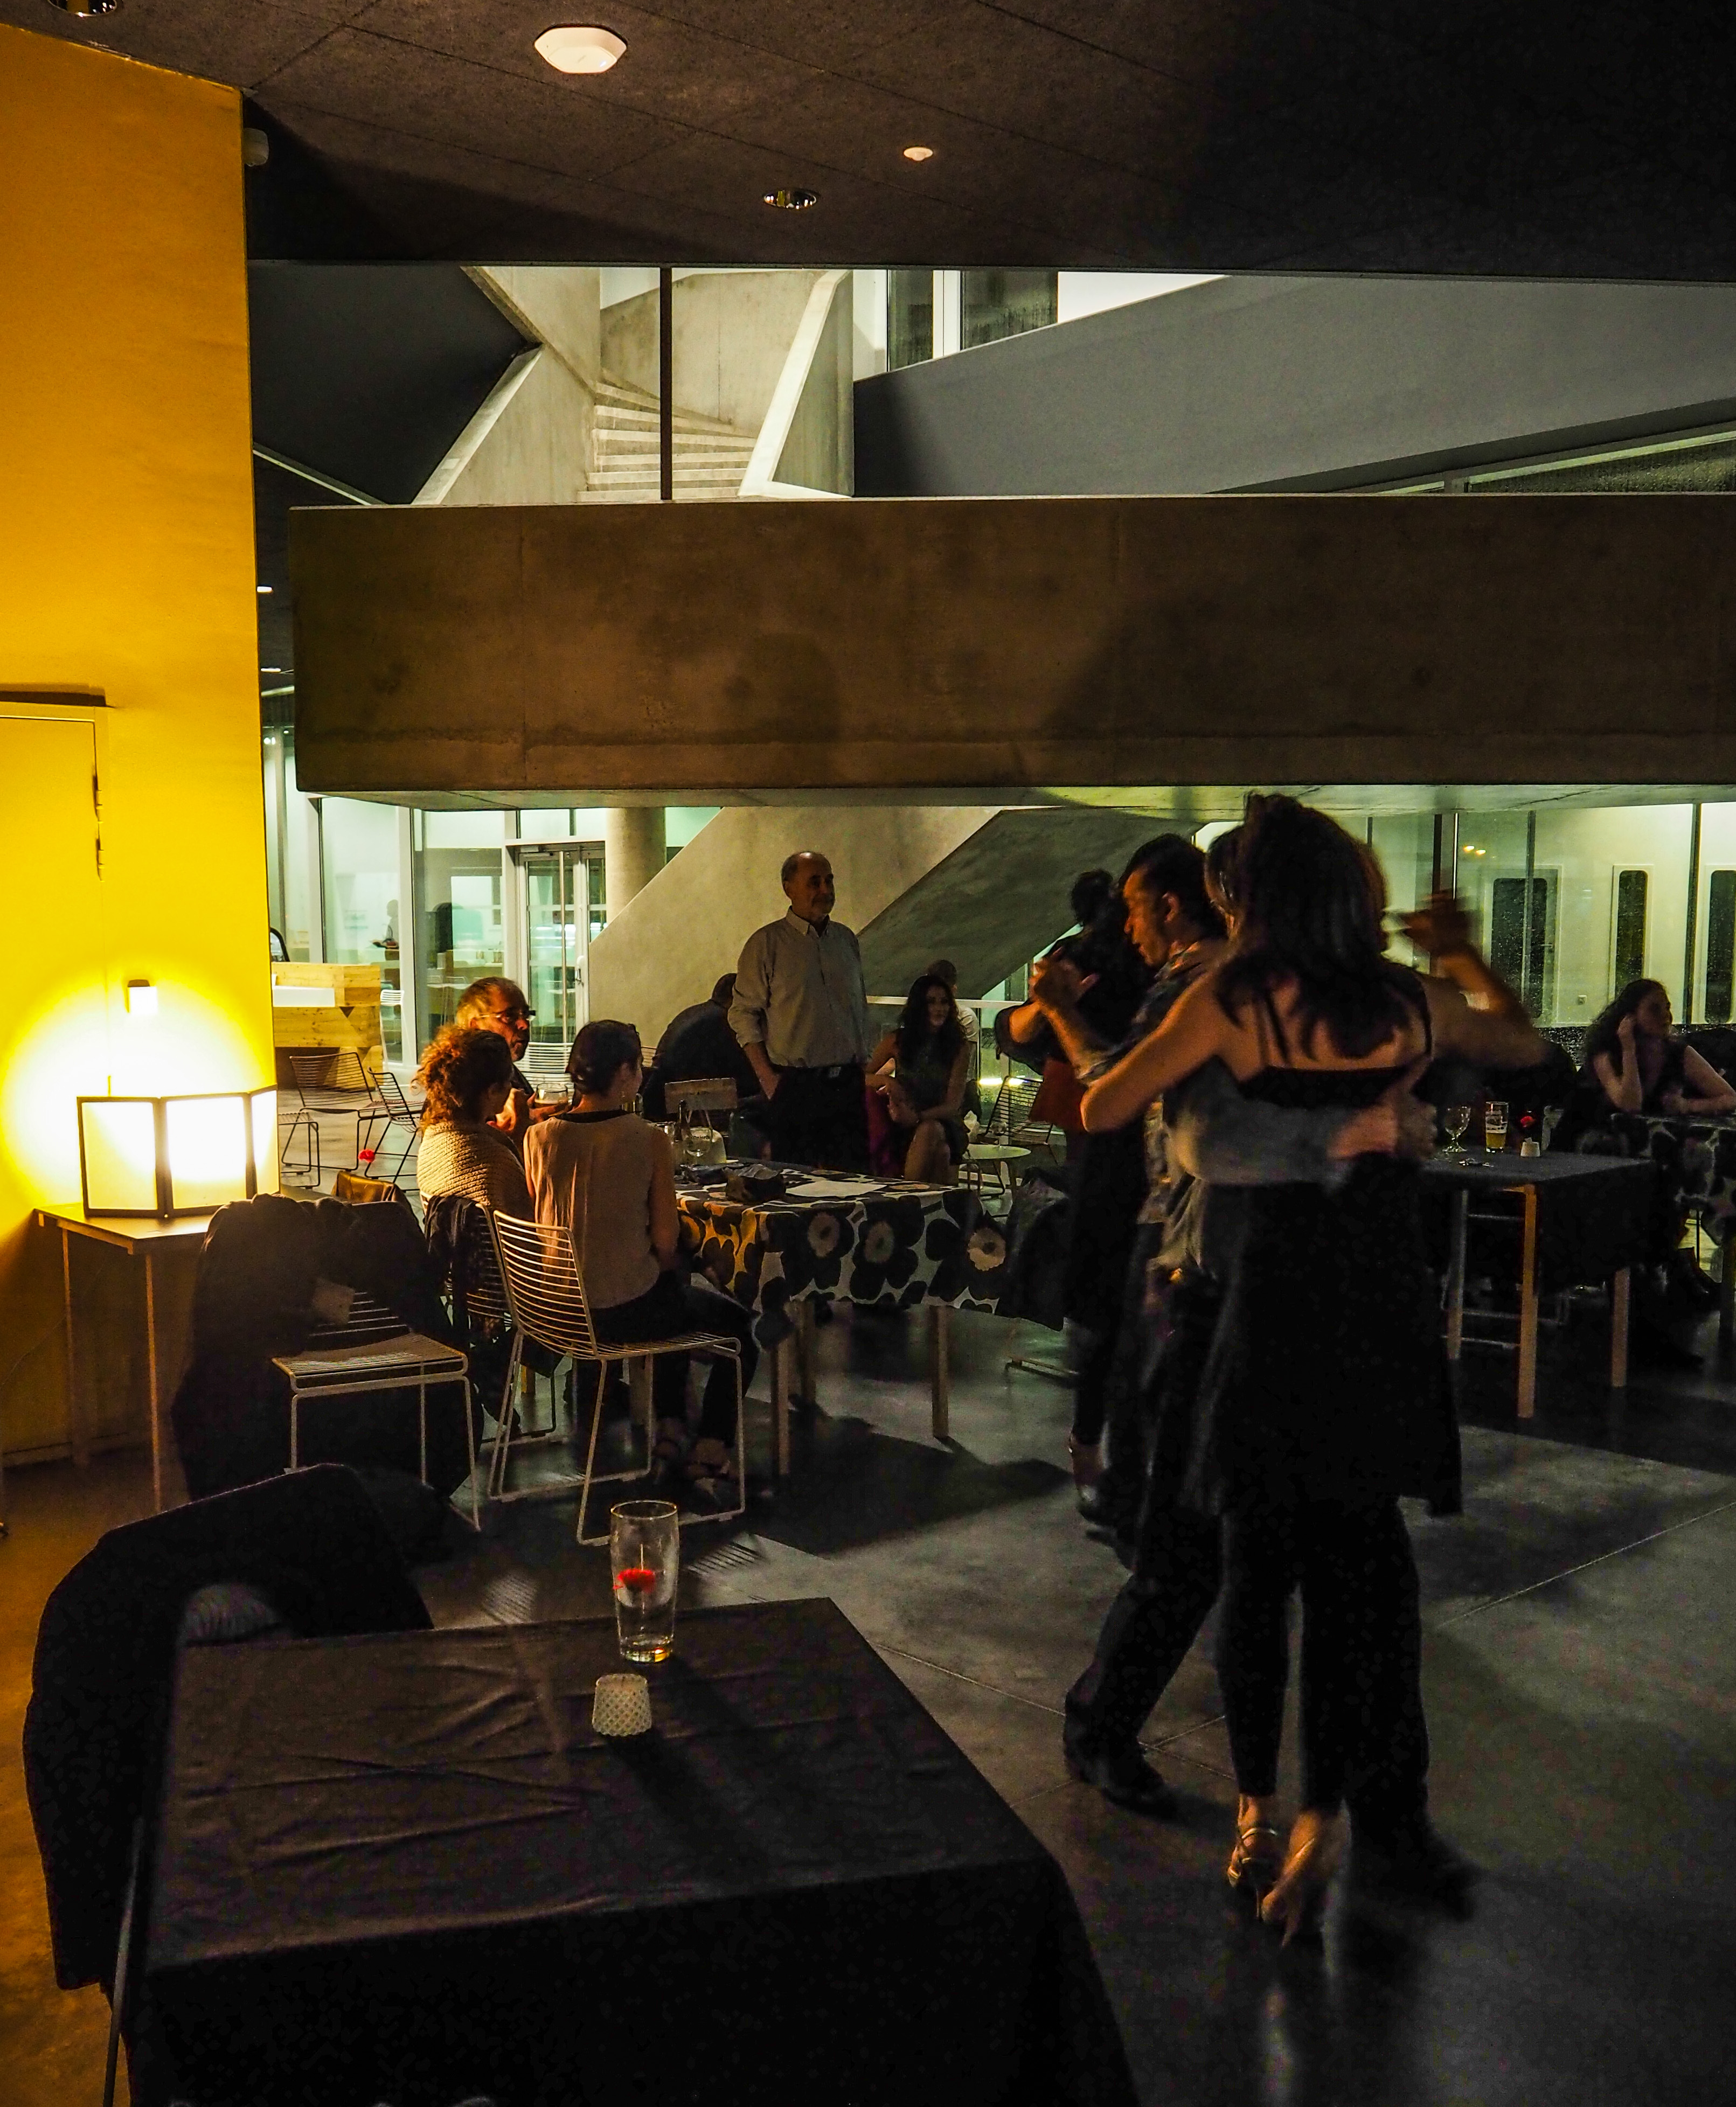 Soirée Milonga et Tango à l'auberge de jeunesse HI Lille